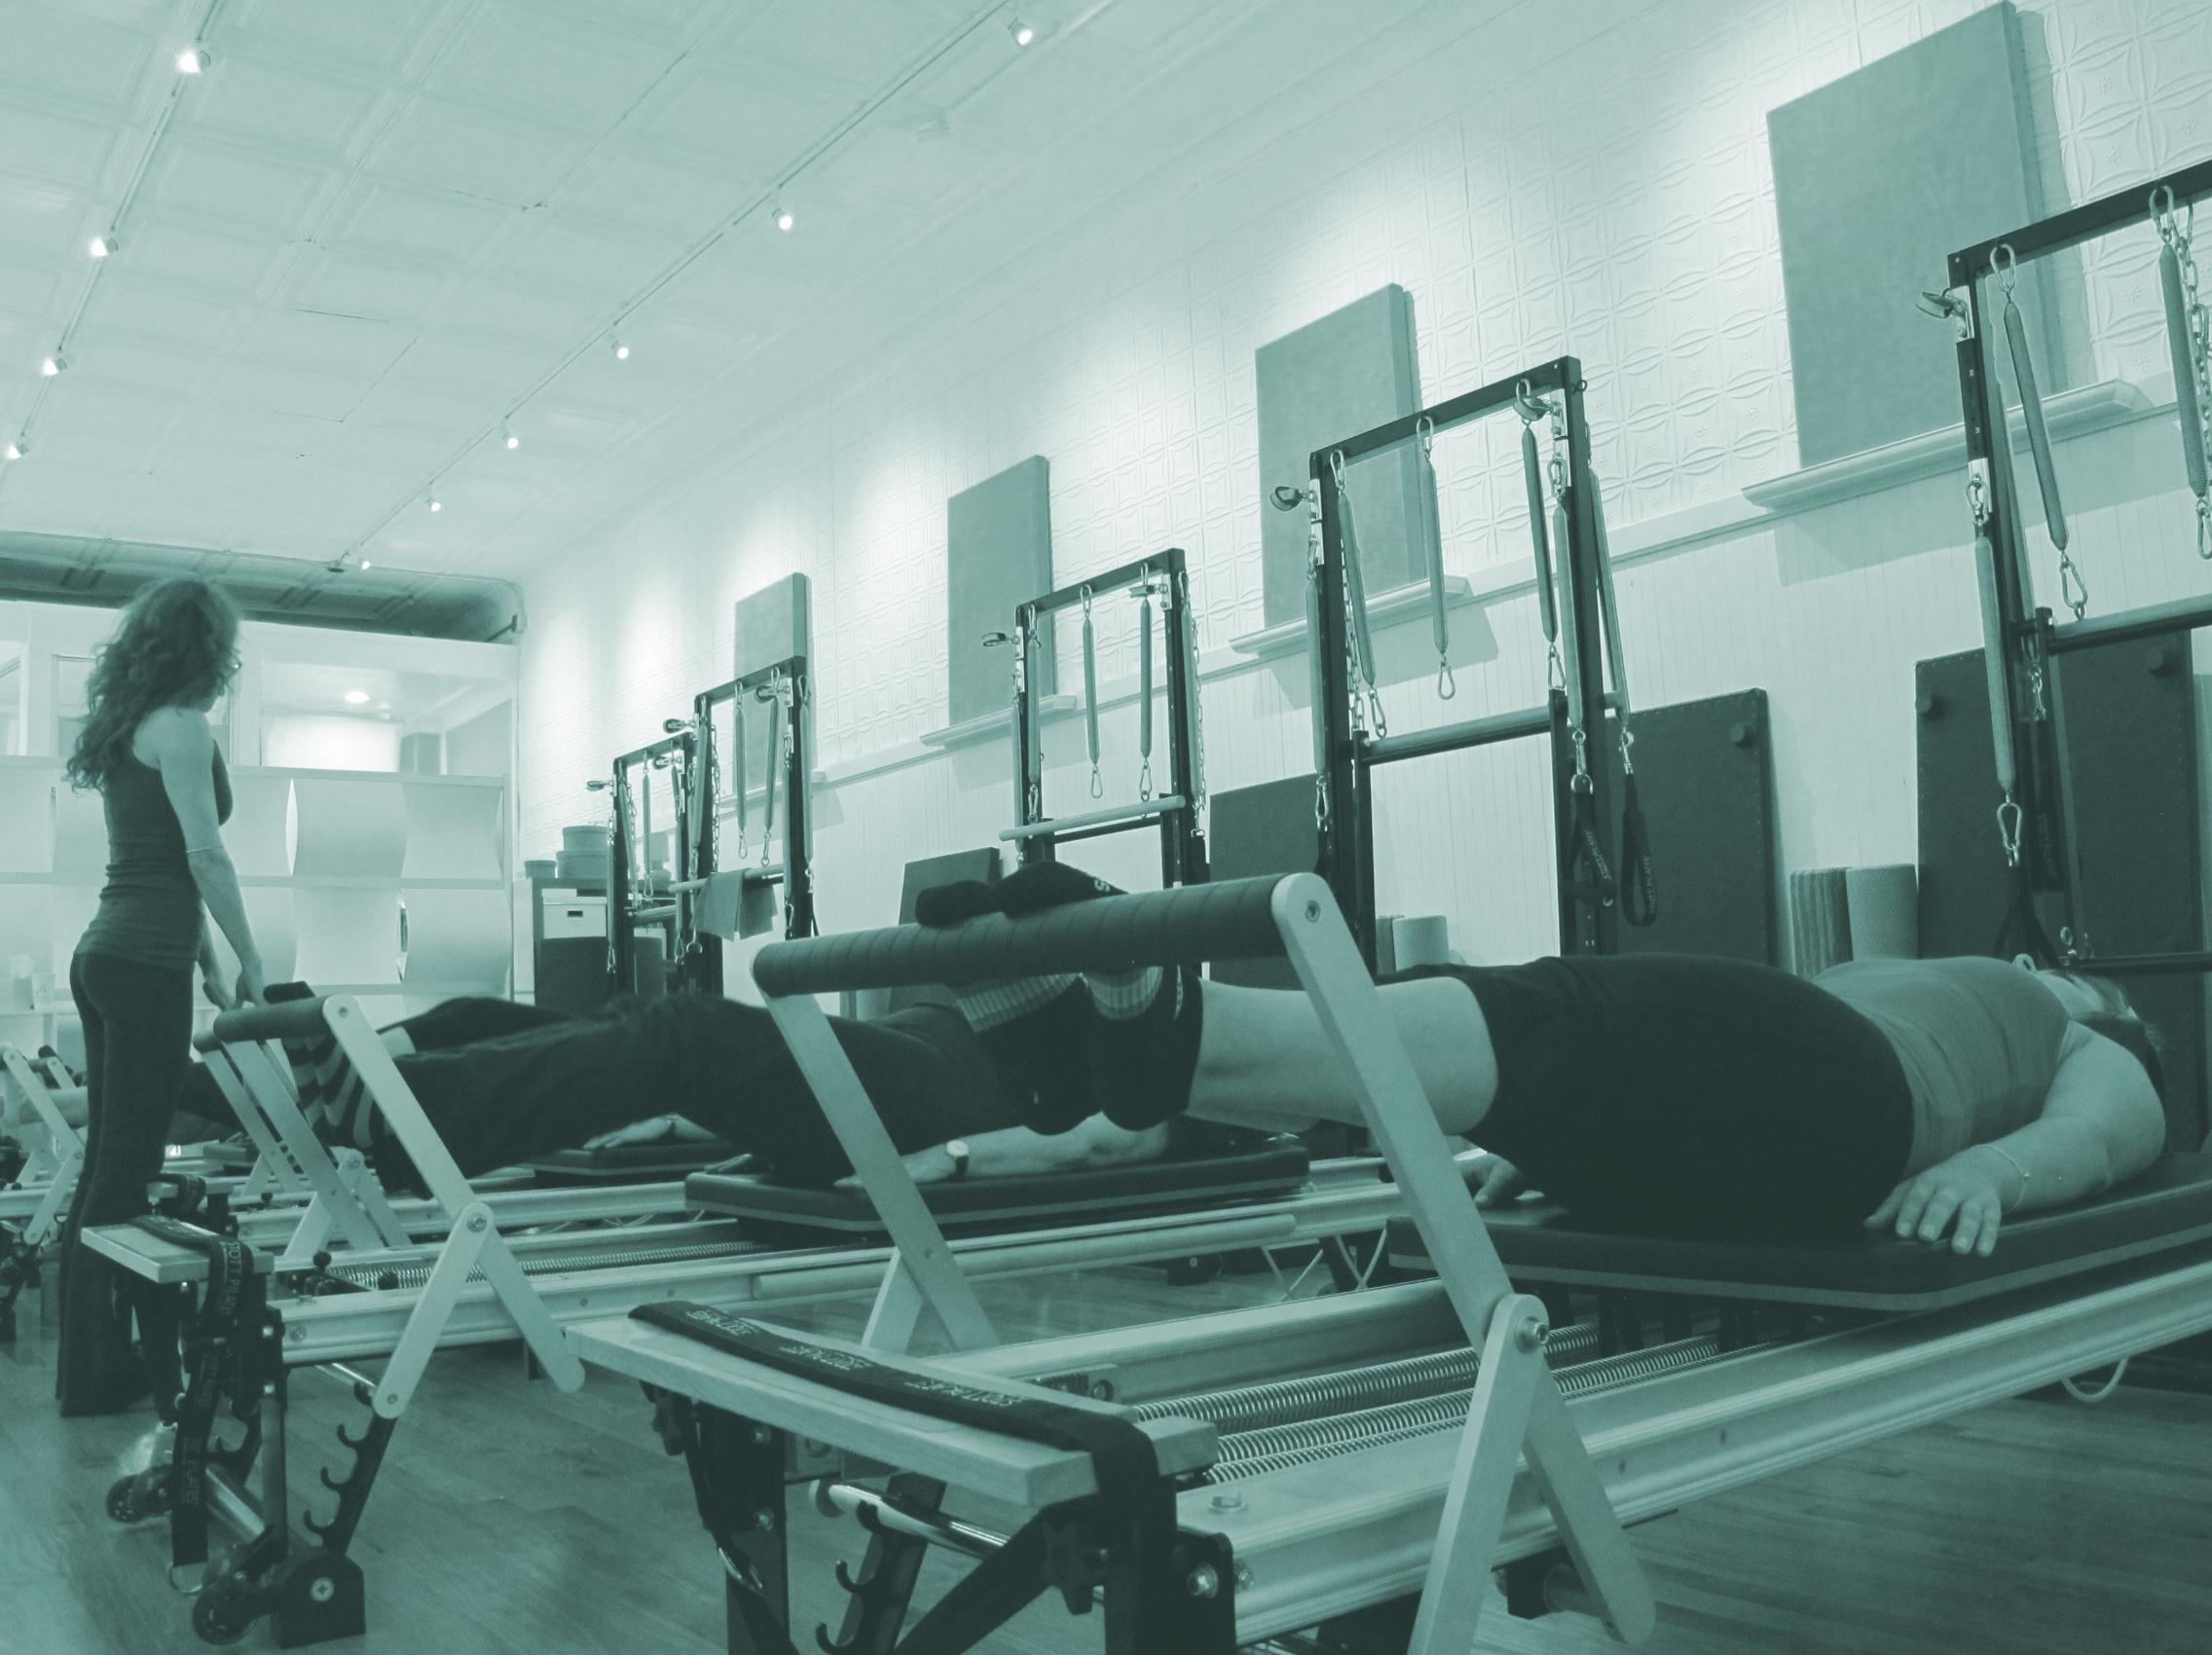 Pilates Reformer Class Cambridge